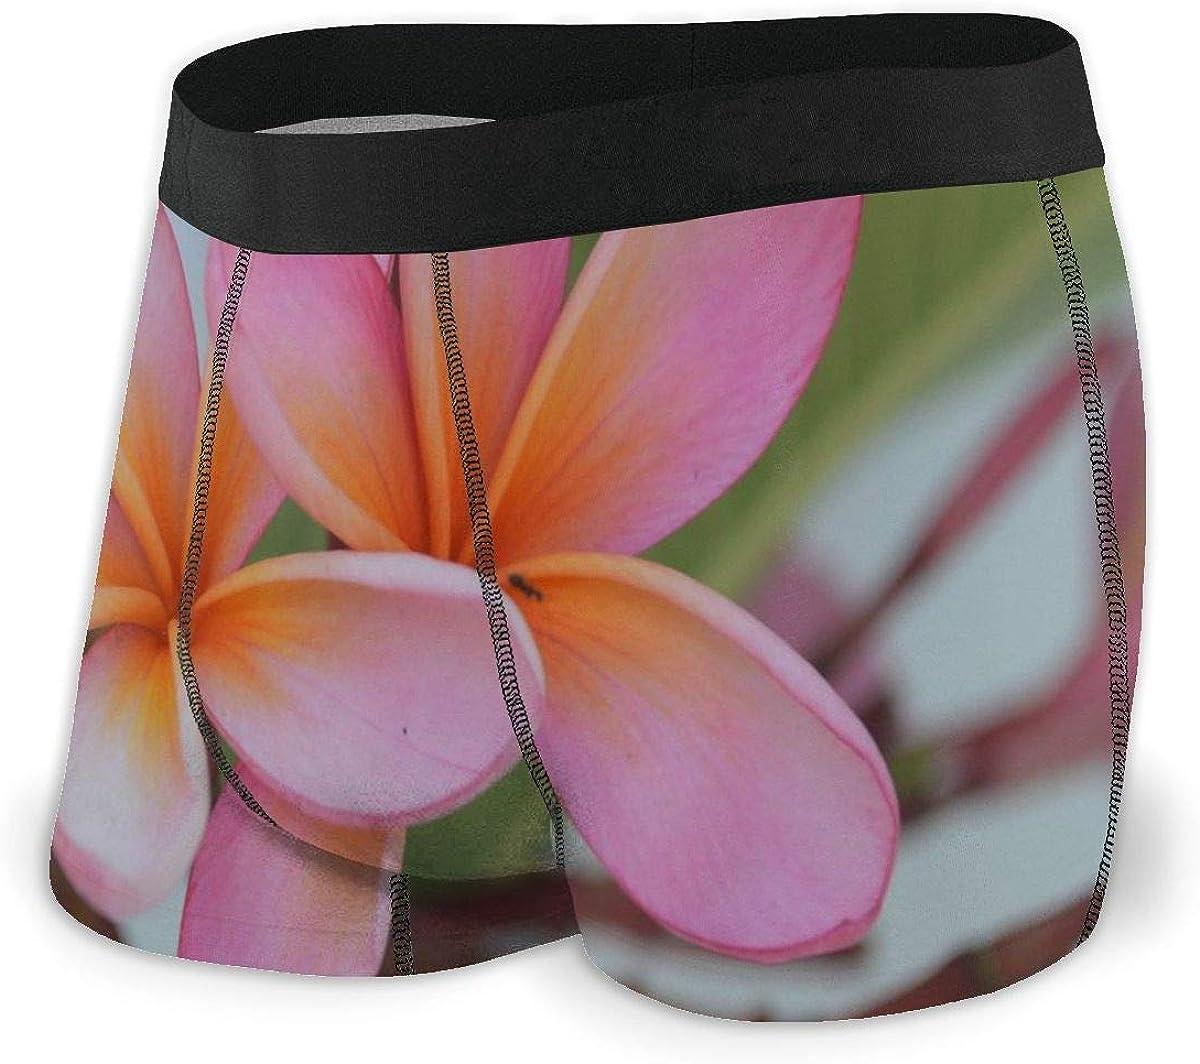 Randolph Wordsworth Mens Boxer Briefs White Plumeria, Frangipani, Pagoda Trees, Natural Breathable Underwear